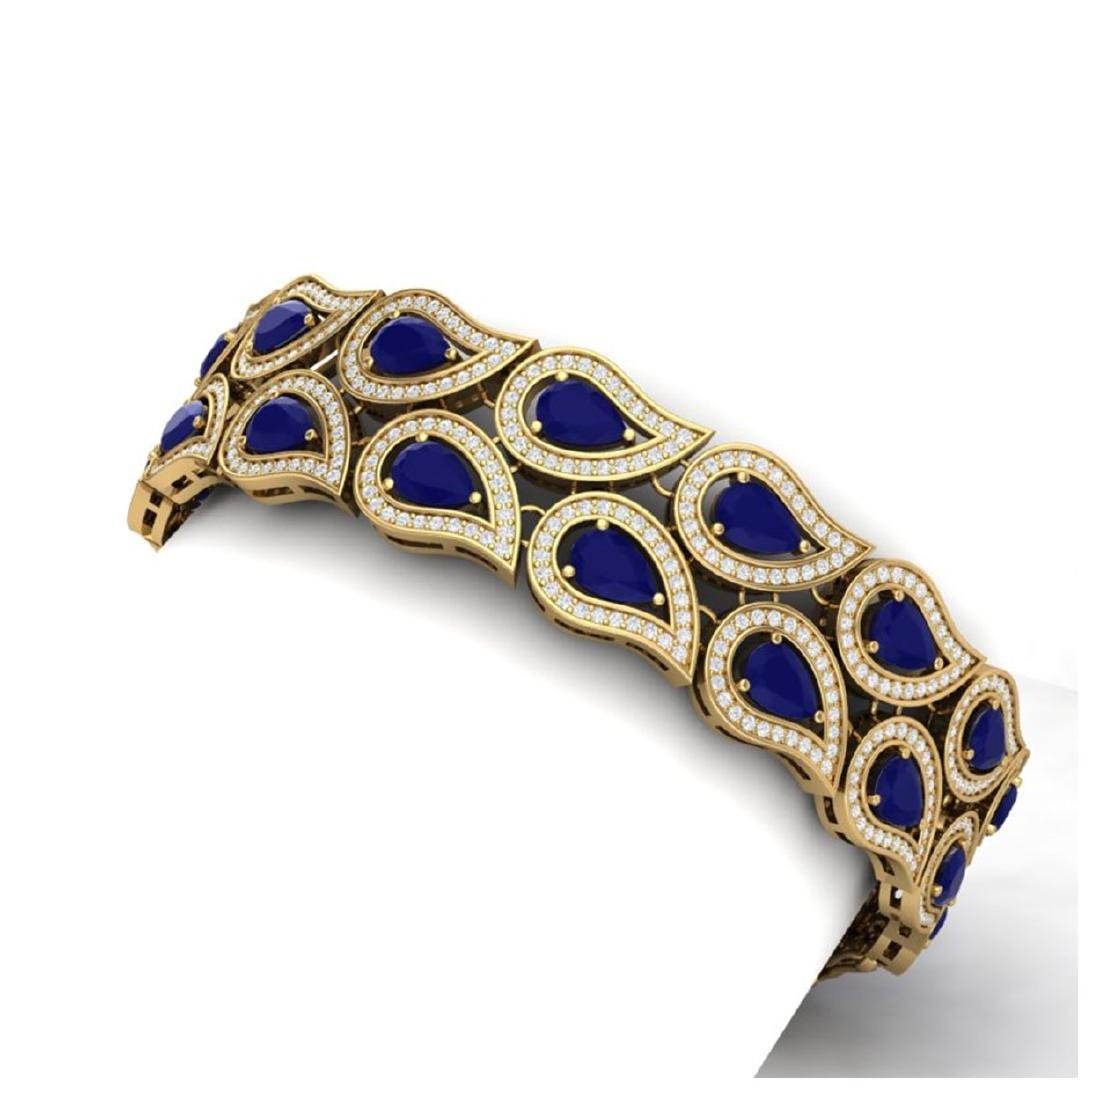 20.1 CTW Royalty Sapphire & VS Diamond Bracelet 18K - 2